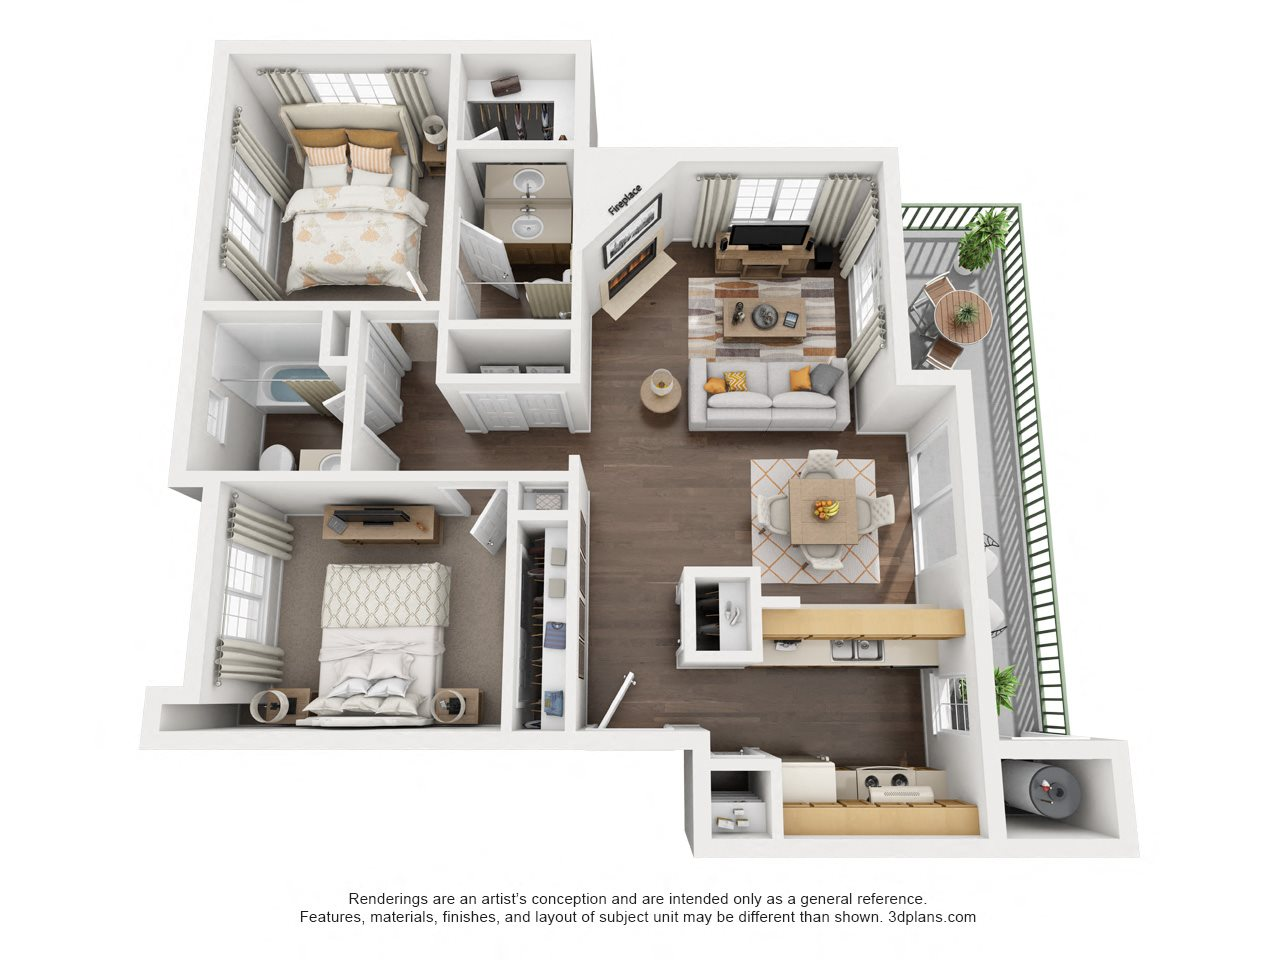 2 Bedroom, 2 Bath, Downstairs Floor Plan 5